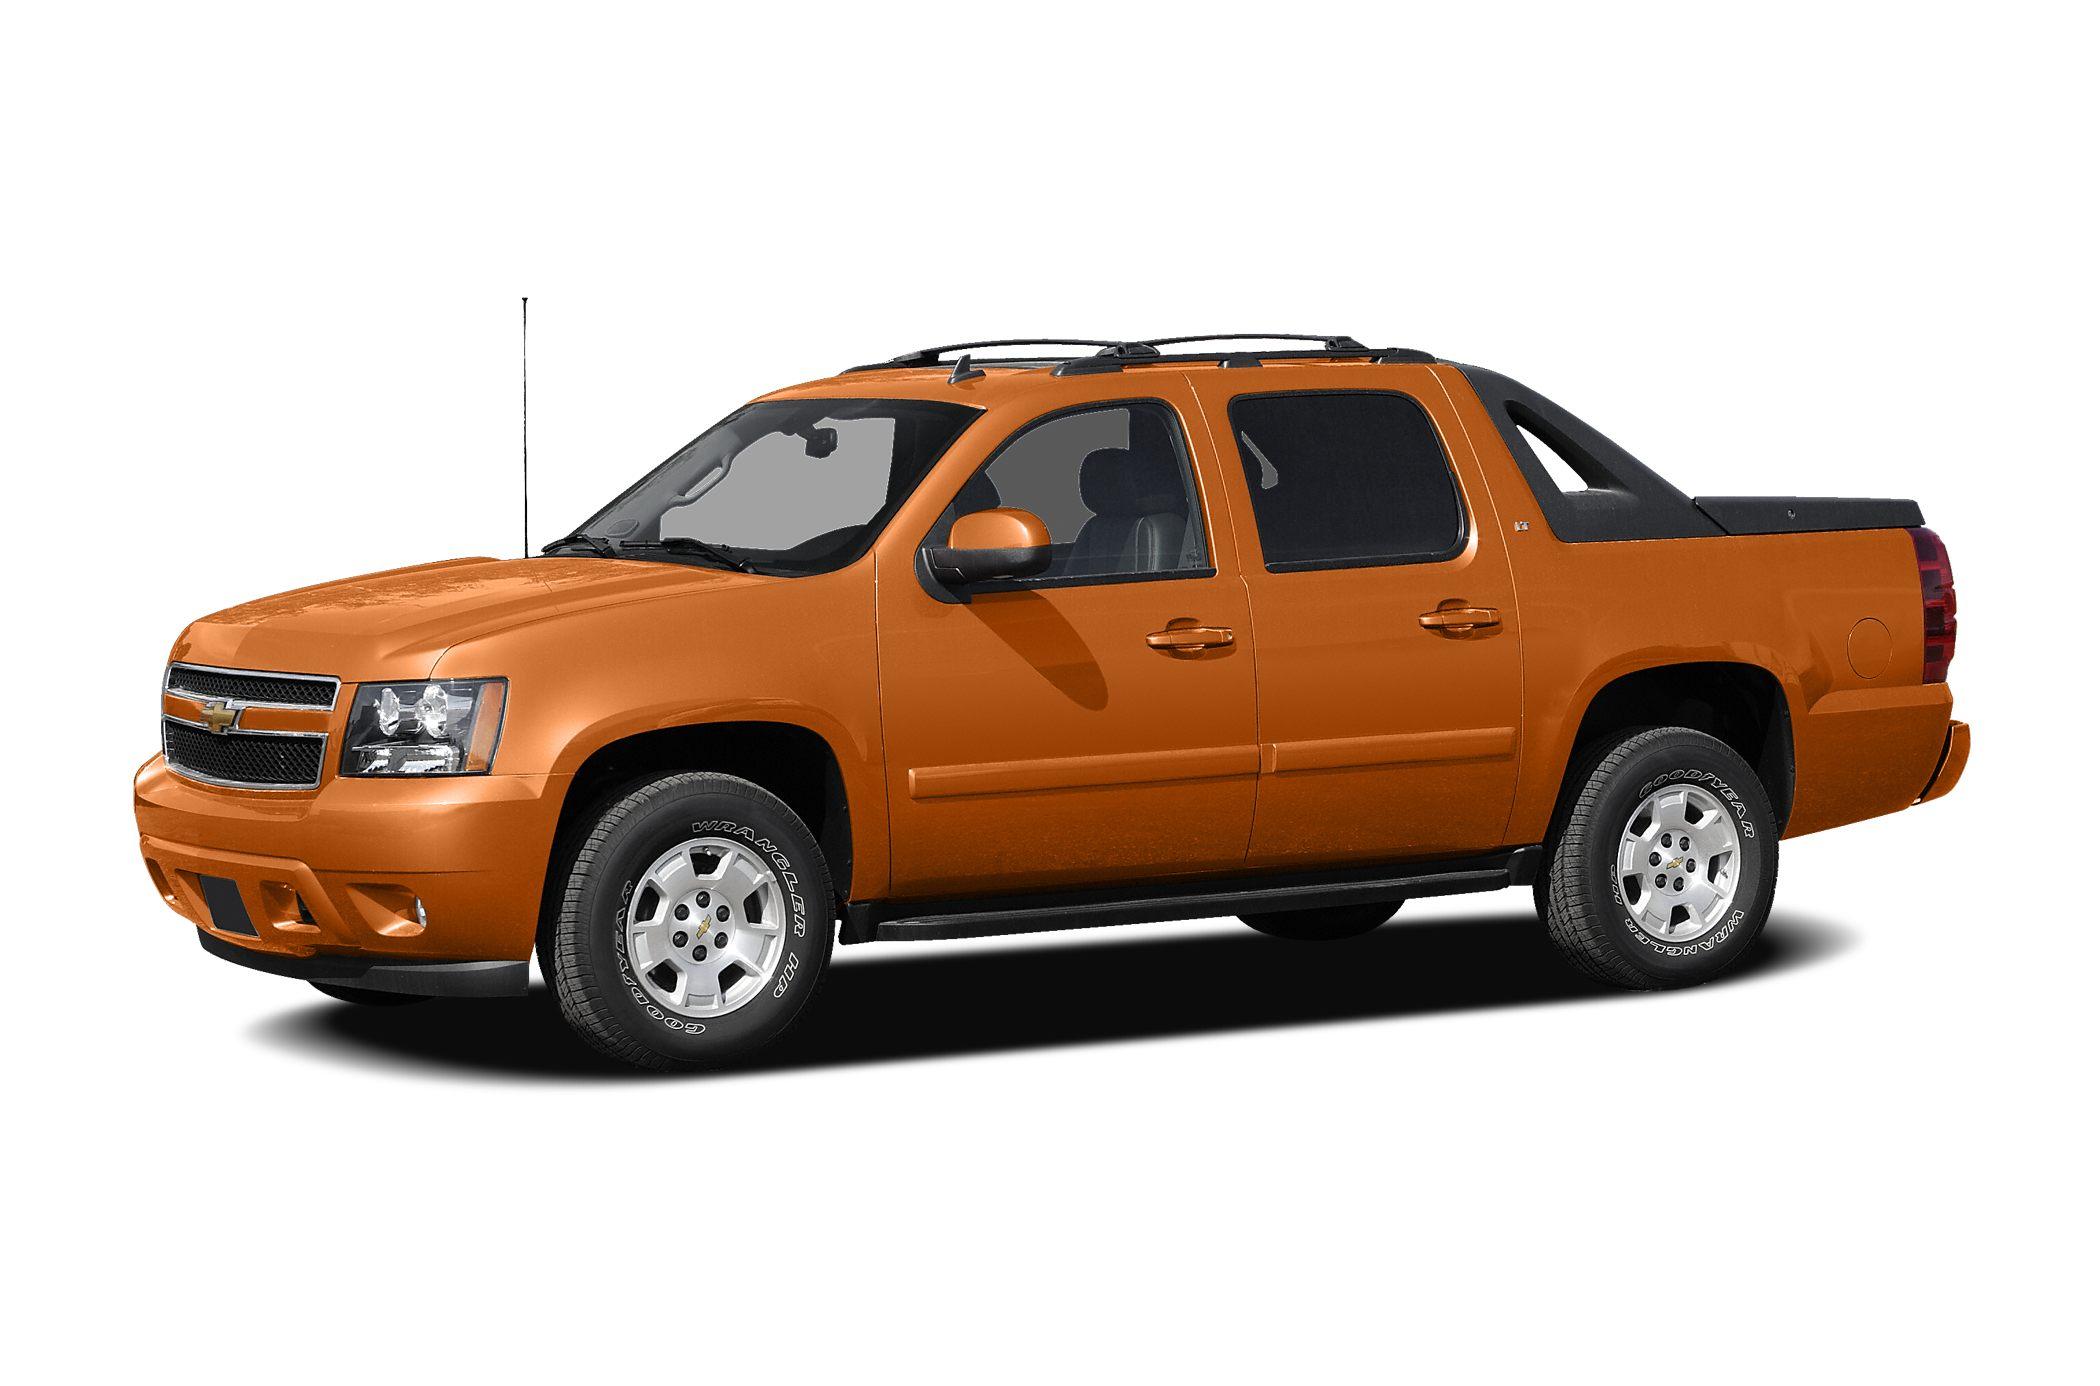 2009 Chevrolet Avalanche 1500